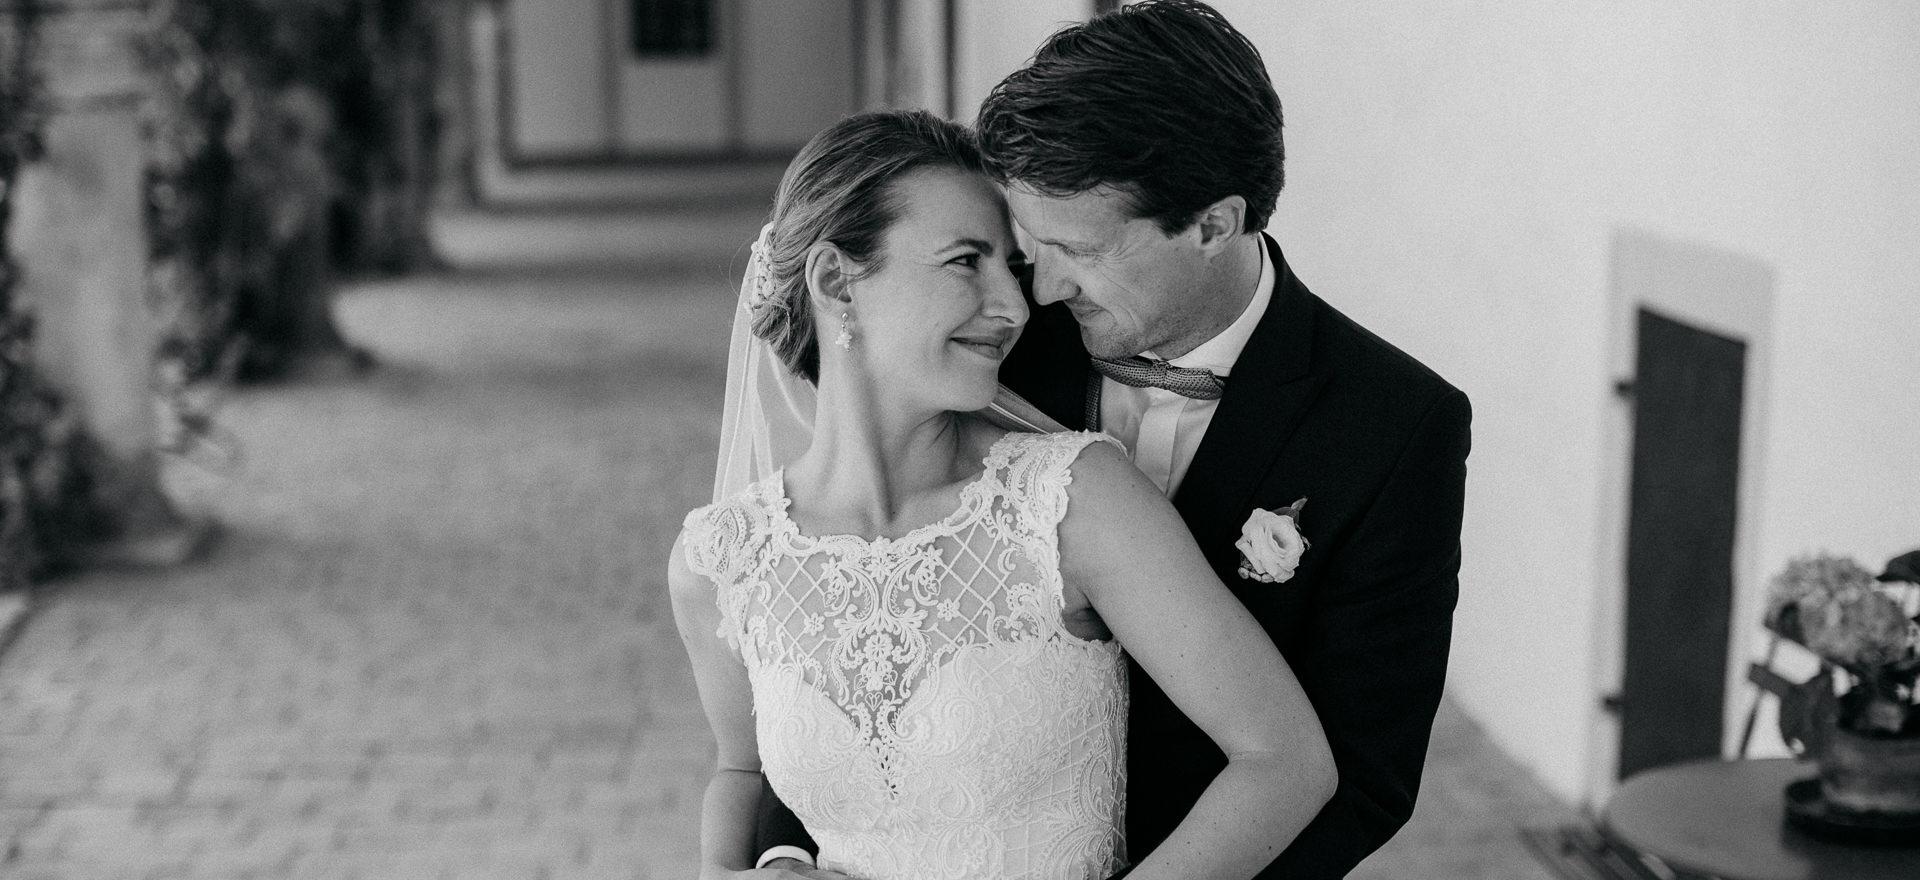 Hochzeitsfotos Paarshooting